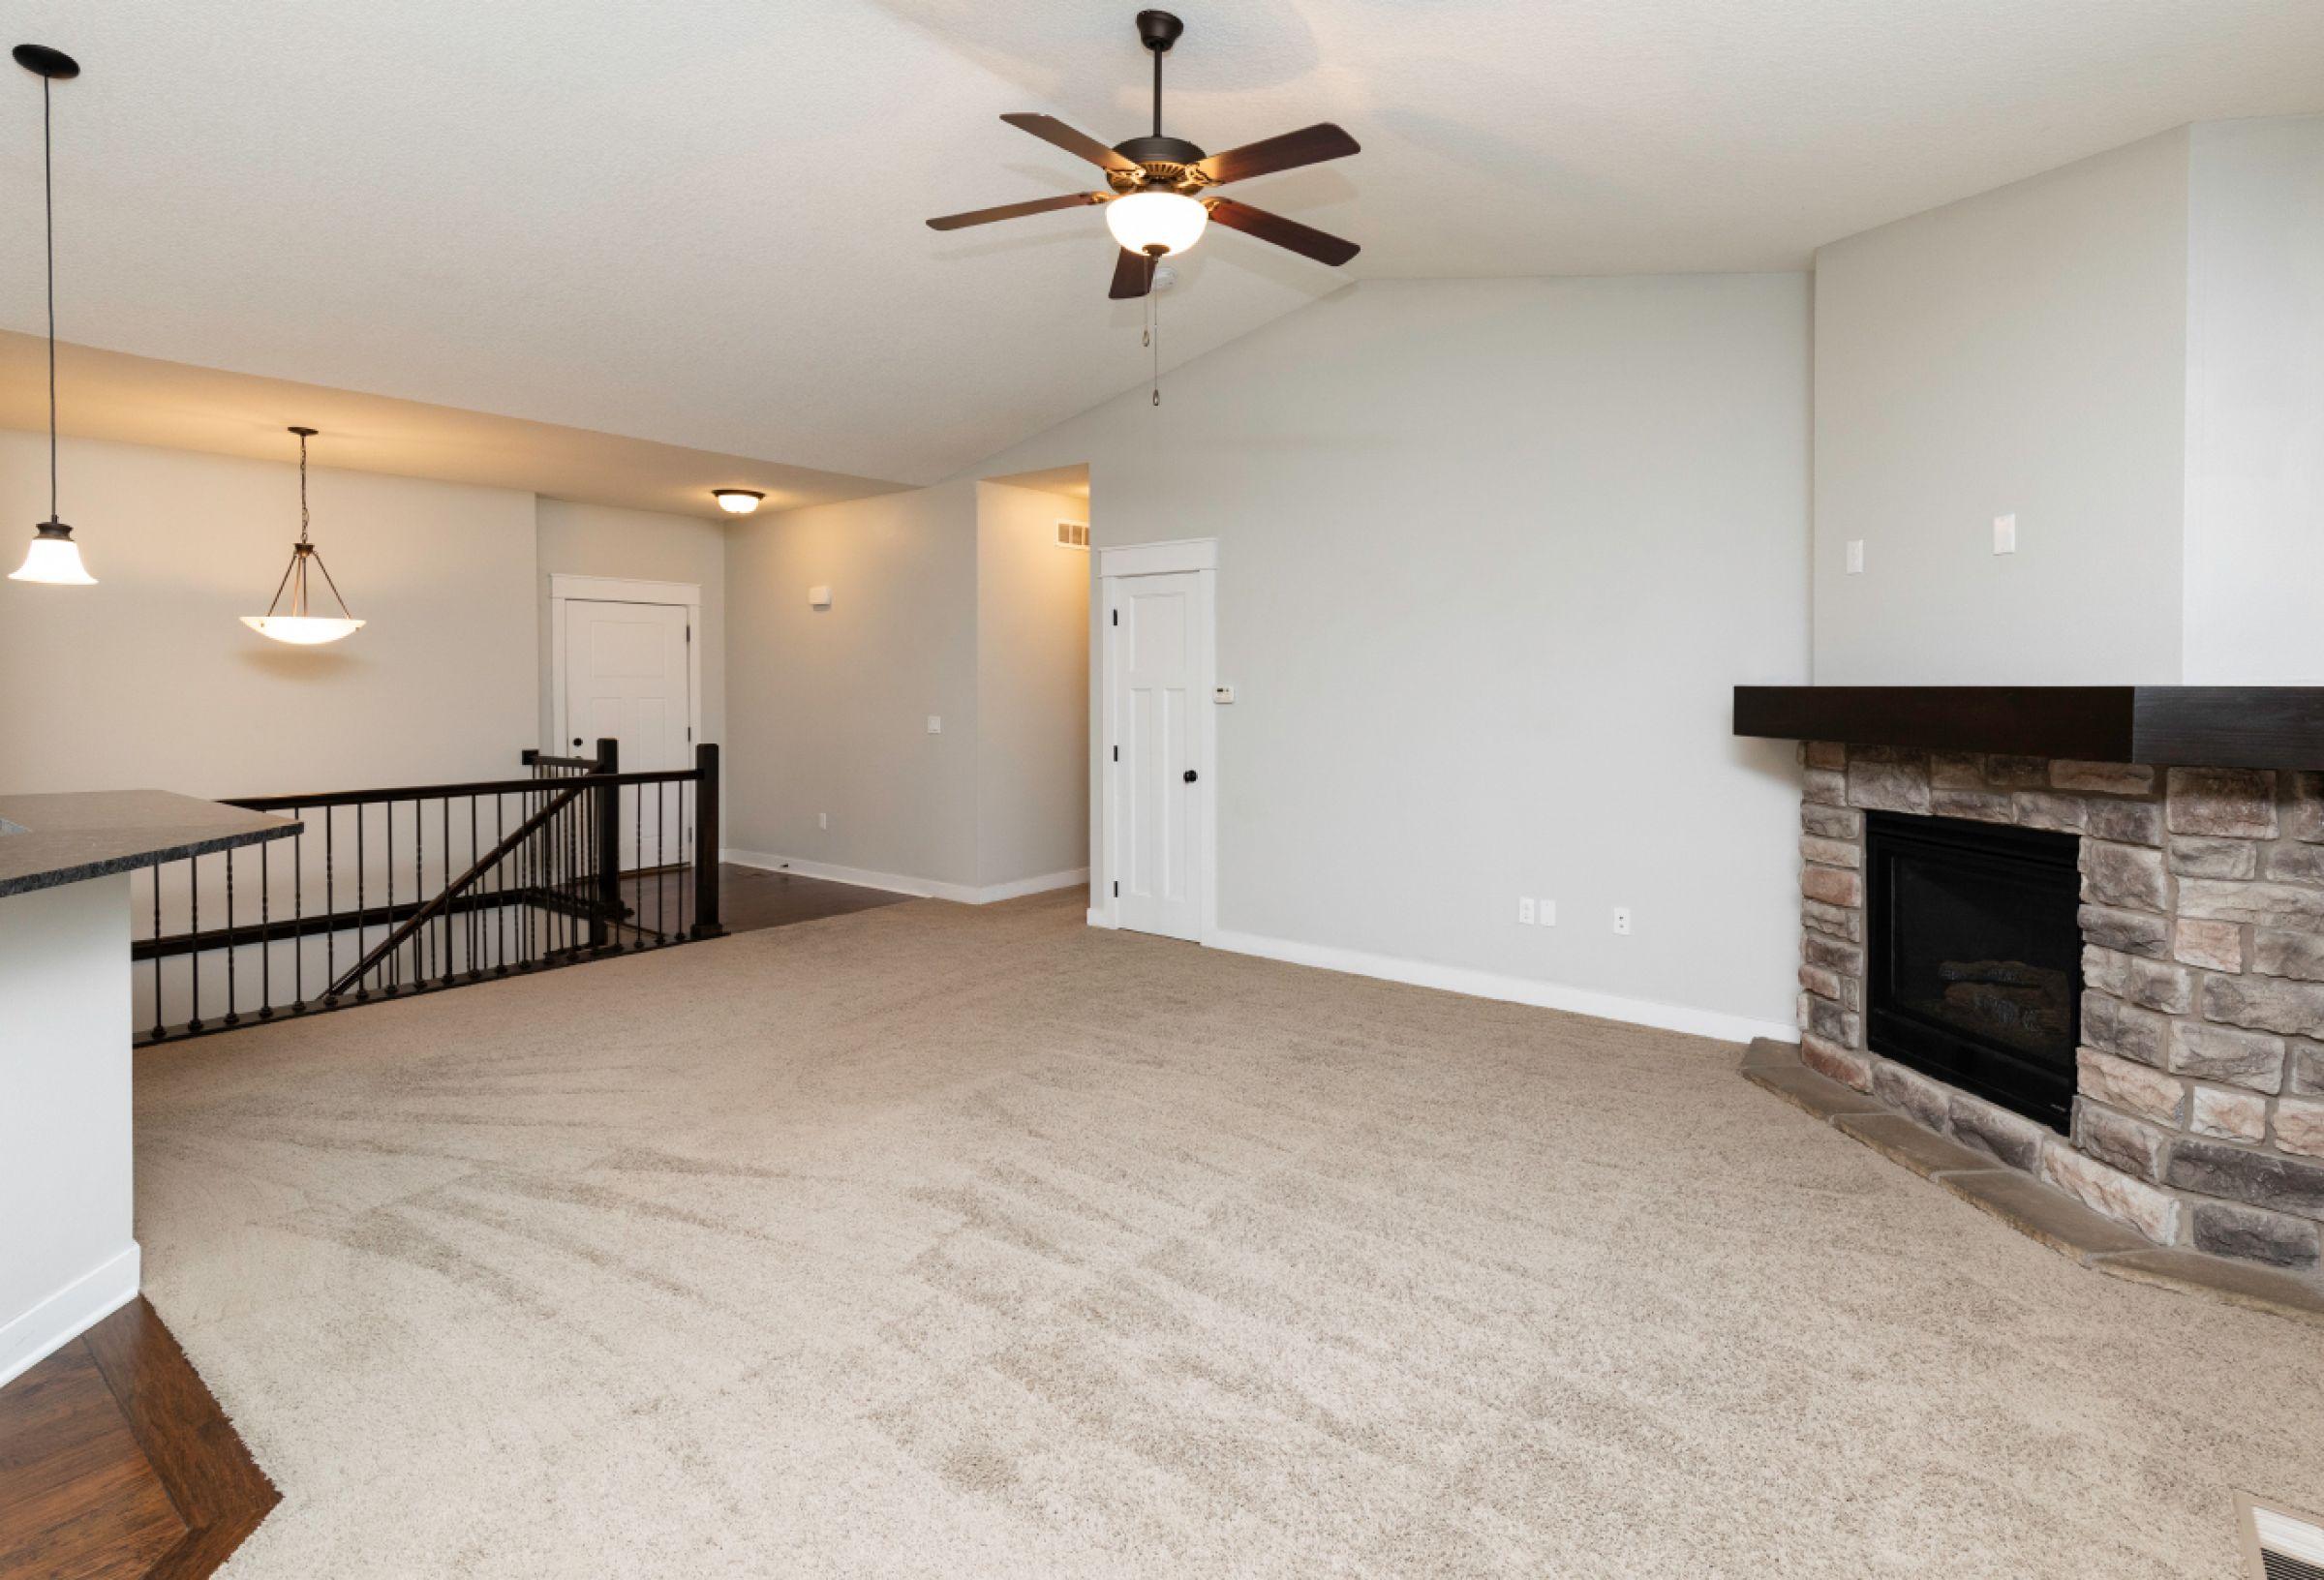 residential-polk-county-iowa-0-acres-listing-number-15273-4-2020-12-07-221513.jpg